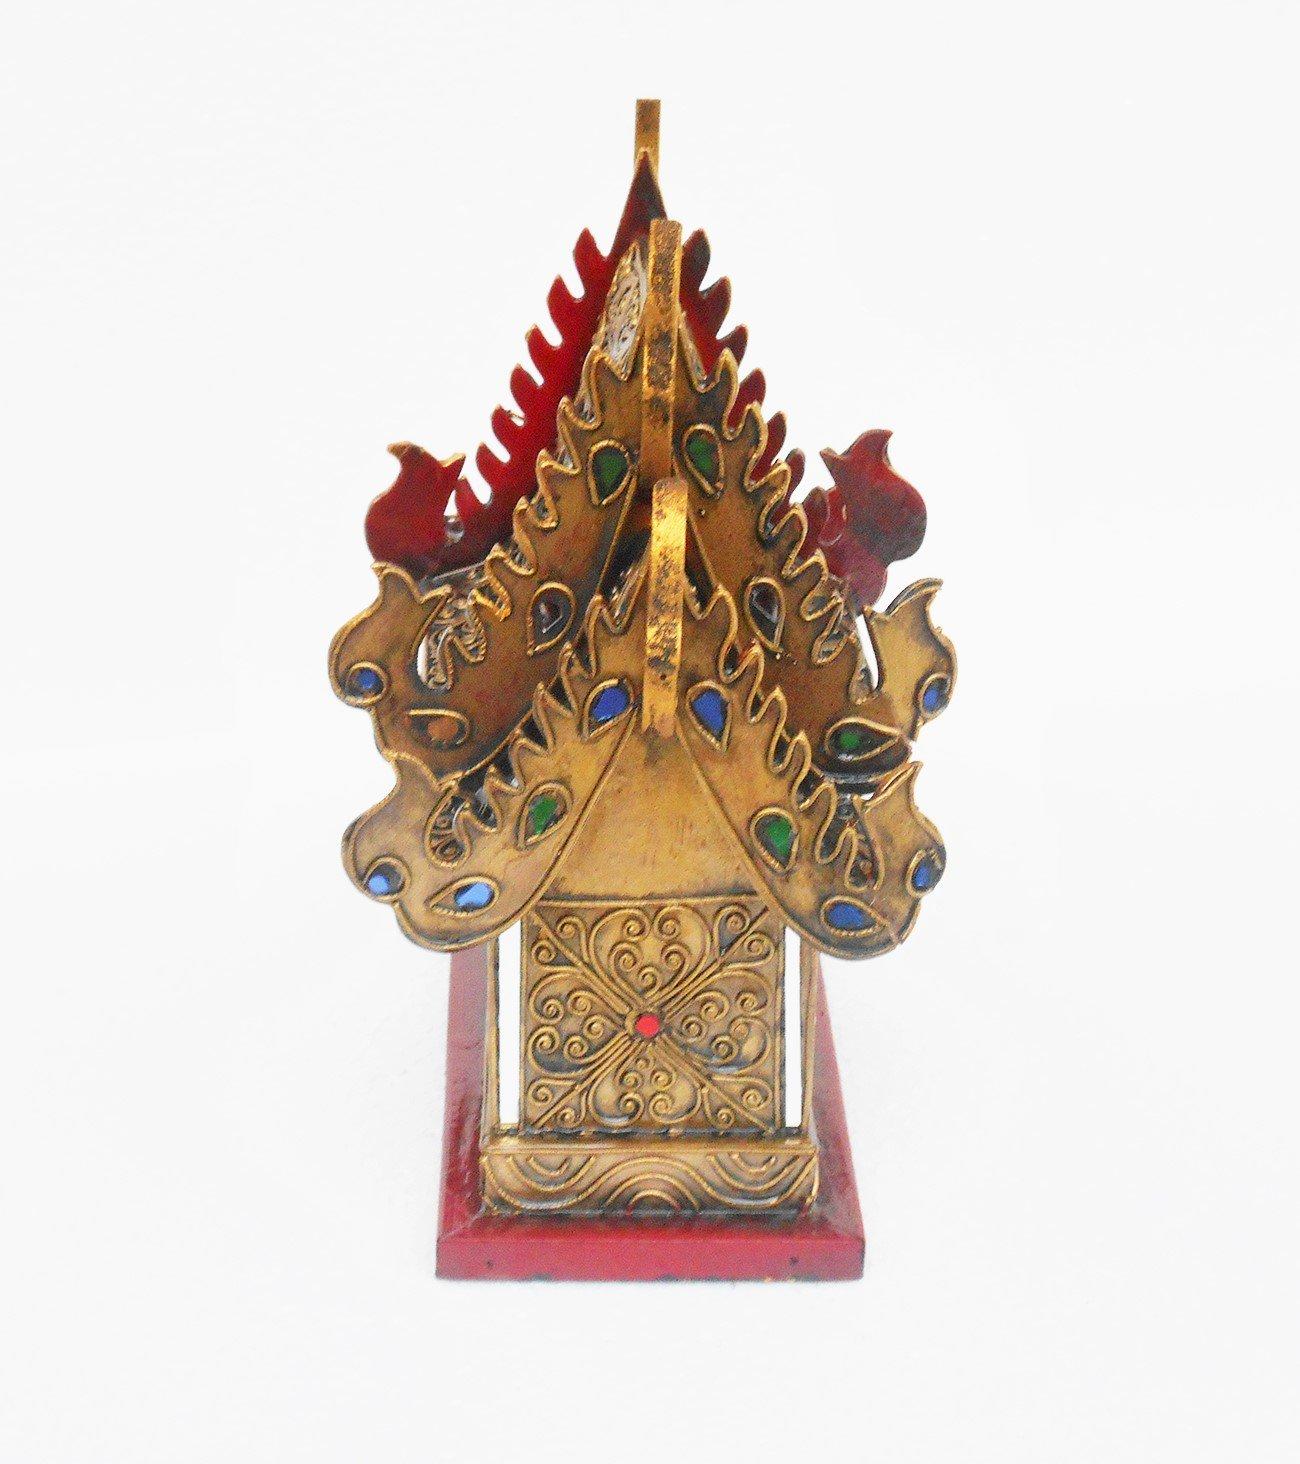 Thai Spirit House Large107 Sanpraphum10 Thai Handmade Spirit House Wood Gold Glass Color, by Thai Spirit House